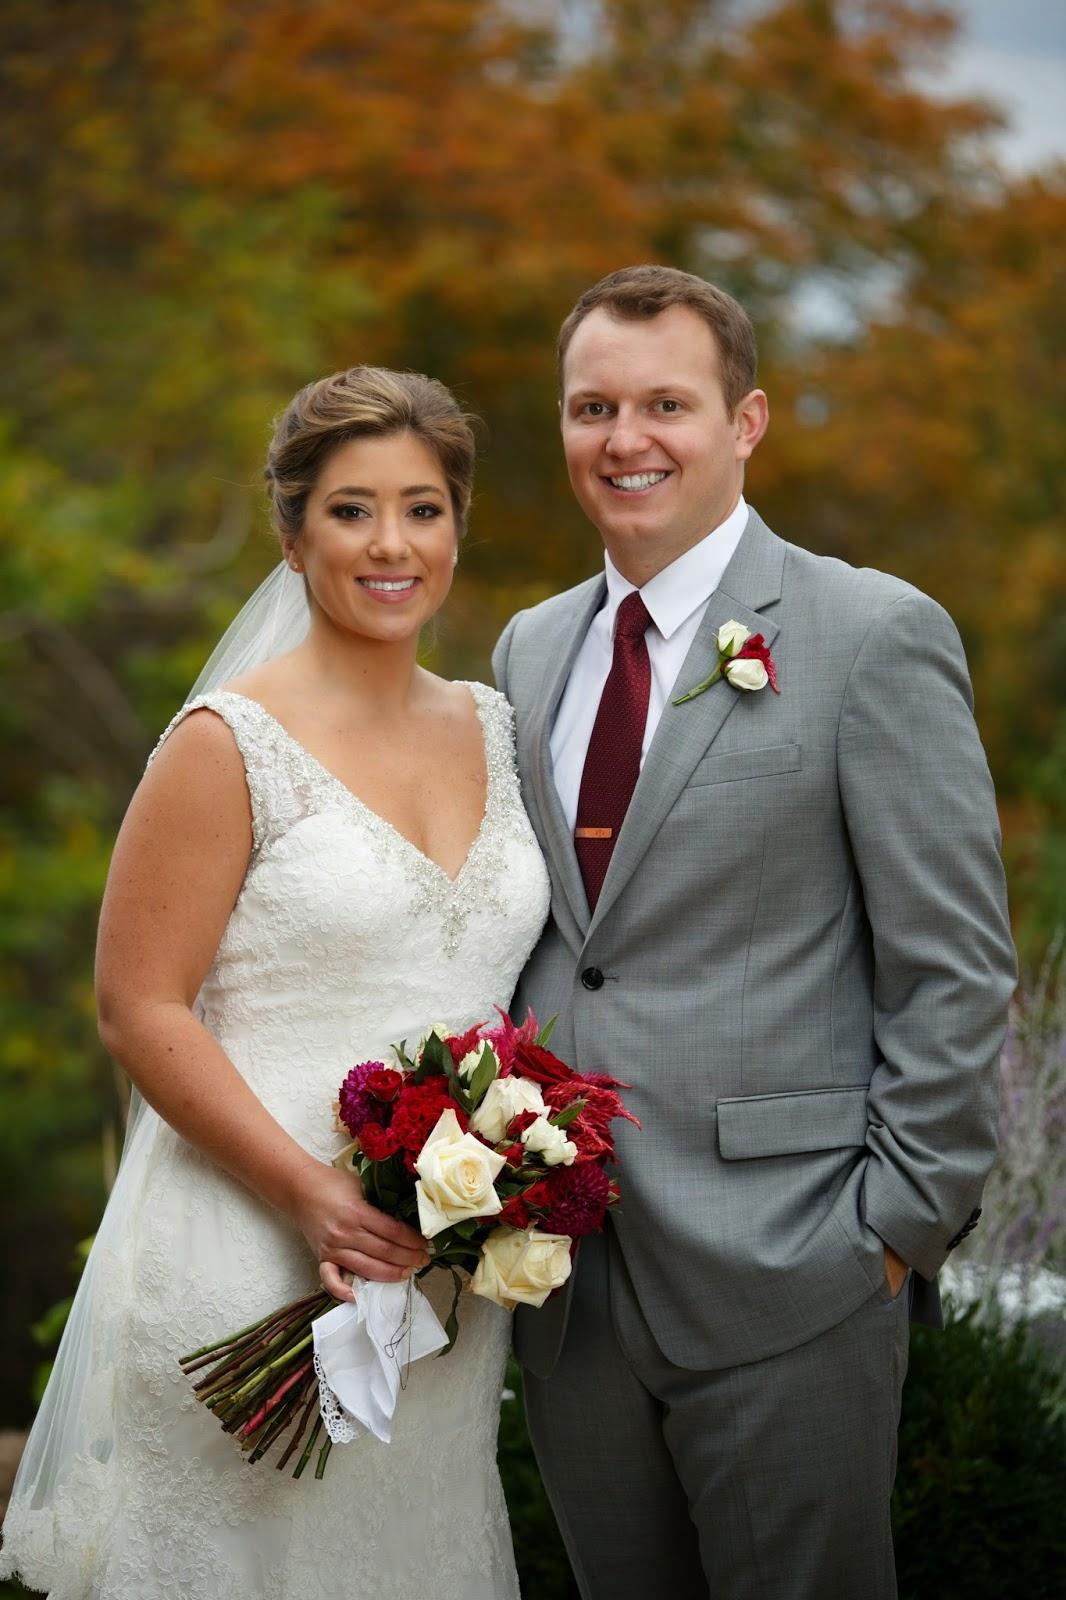 Cable Photography & Video: Mckenzie Breeding & Alex Thorpe - Wedding ...